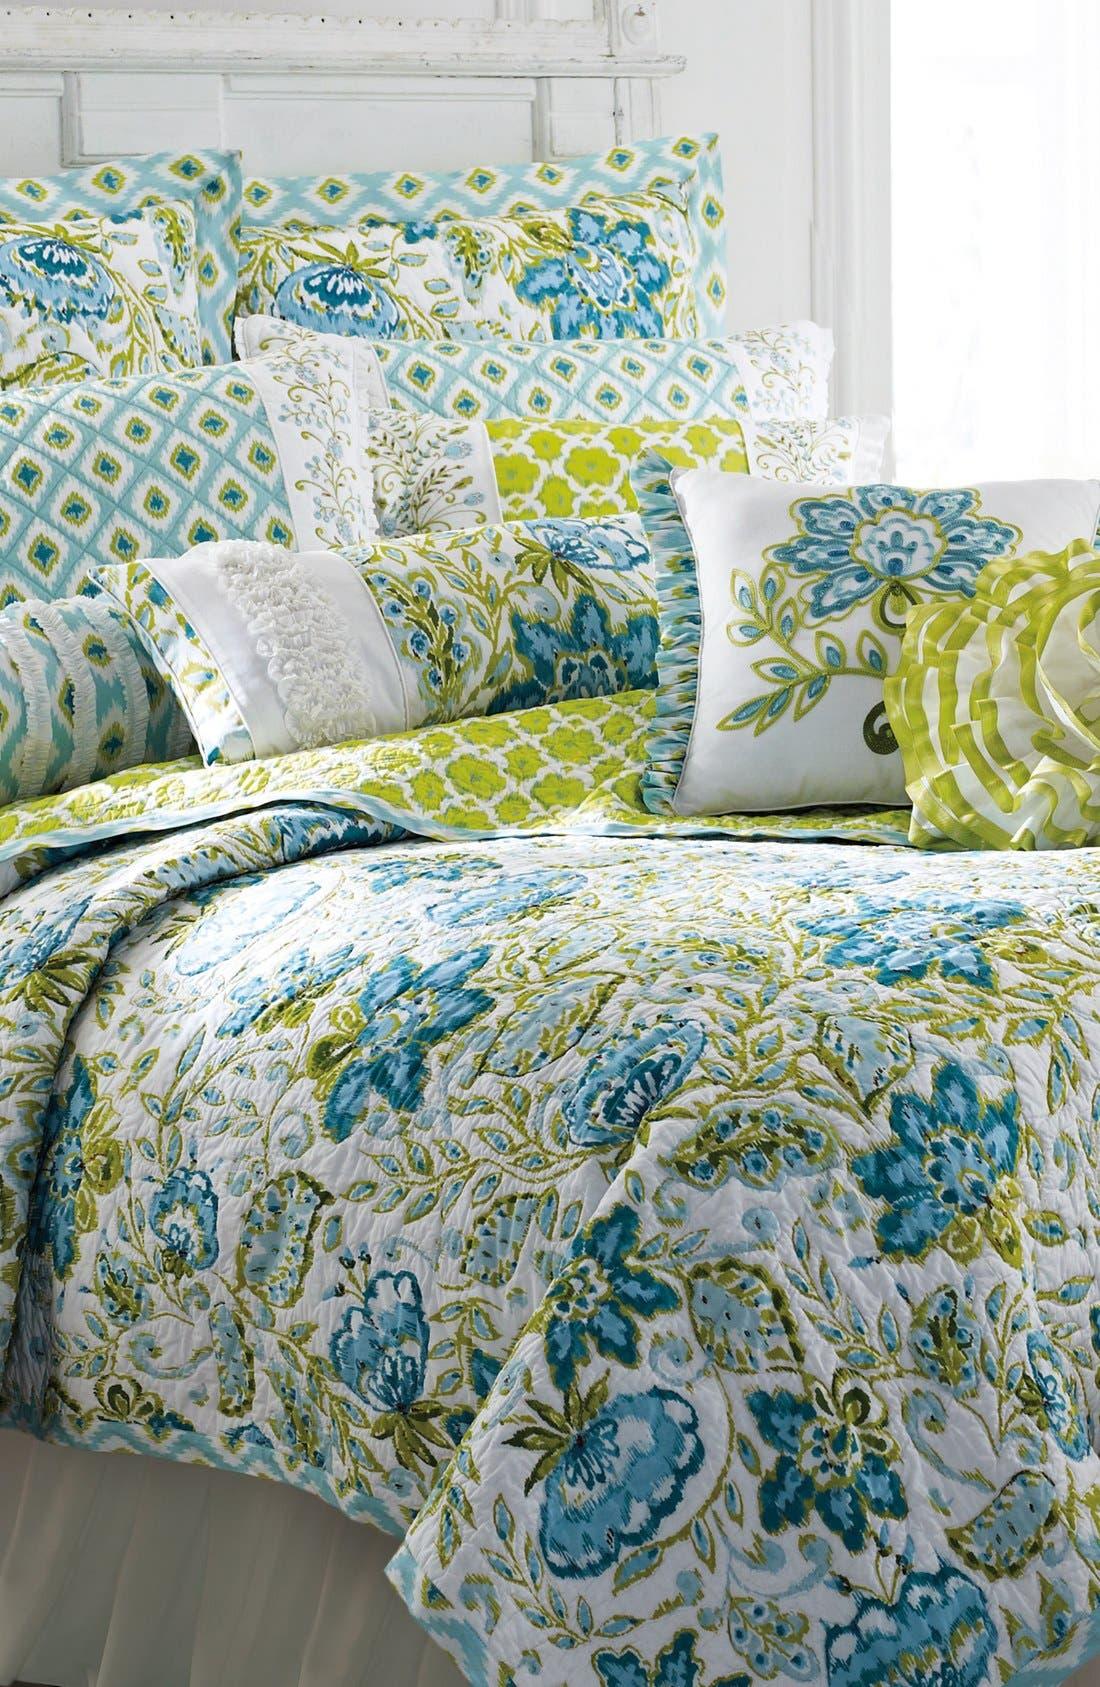 Alternate Image 1 Selected - Dena Home 'Seraphina' Print Quilt